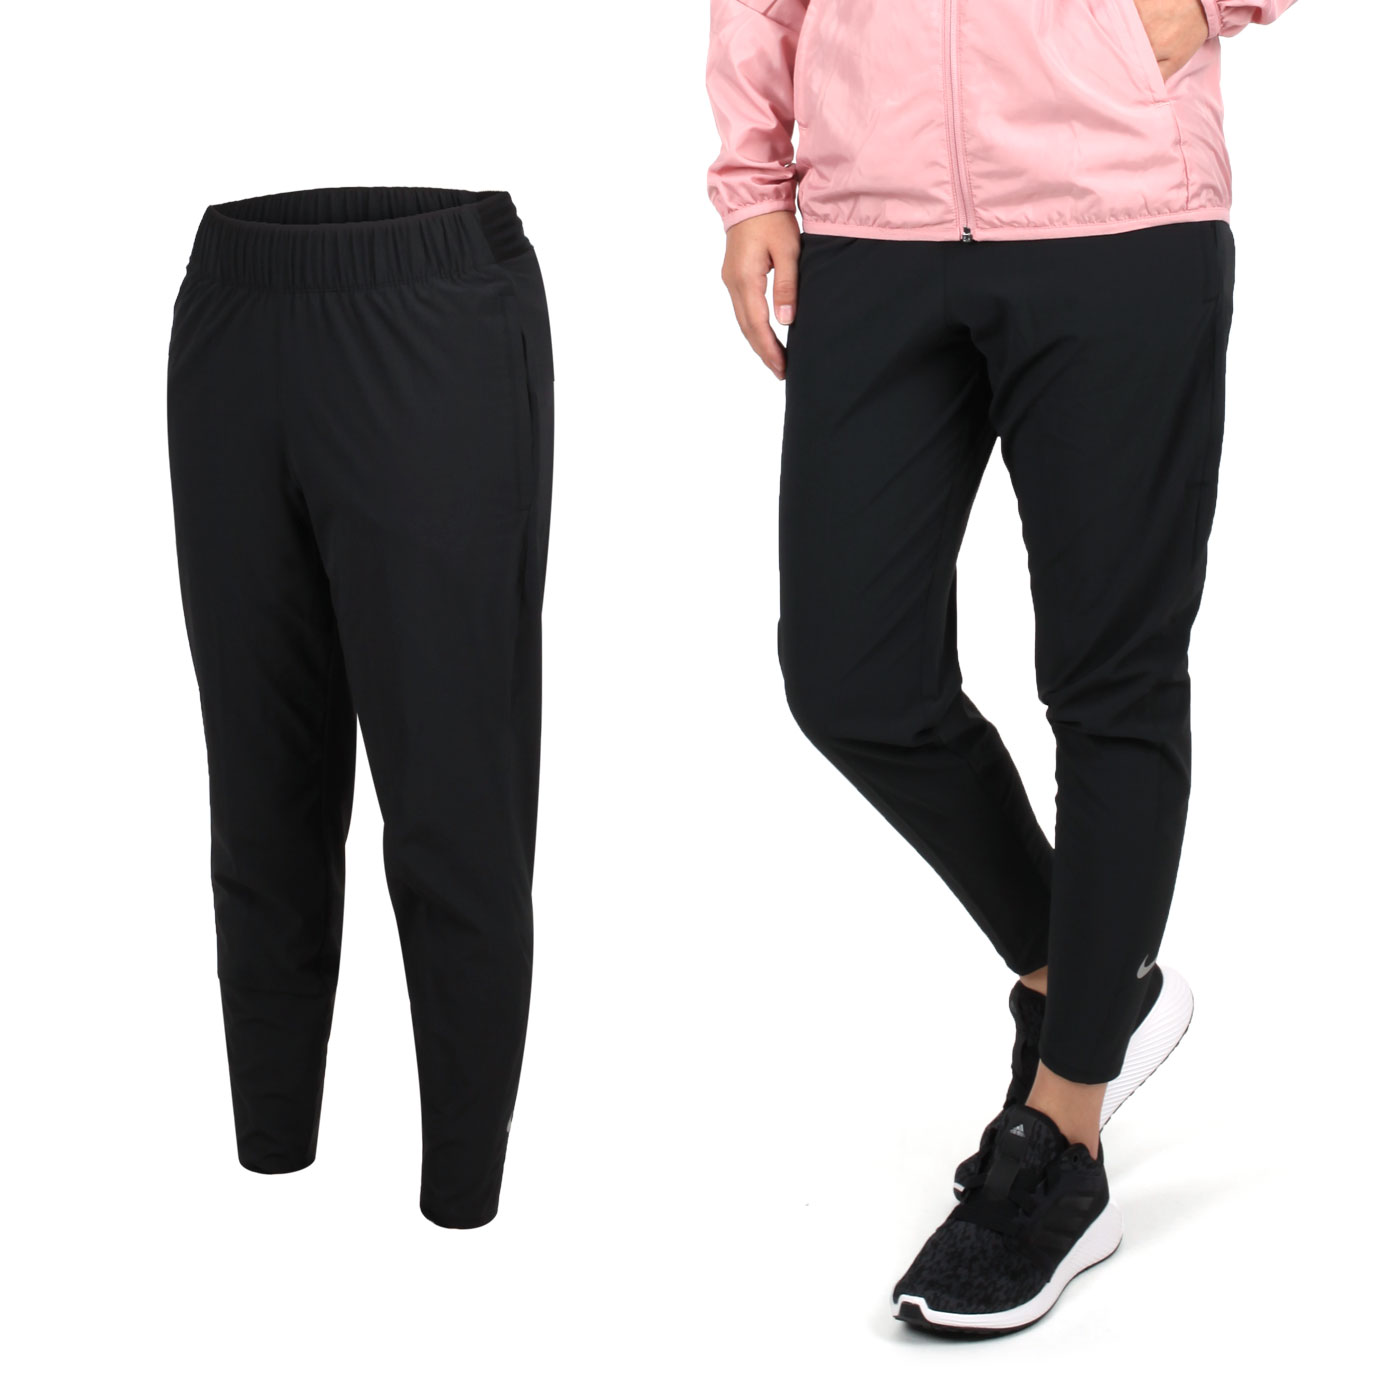 NIKE 女款運動長褲 BV2899011 - 黑銀